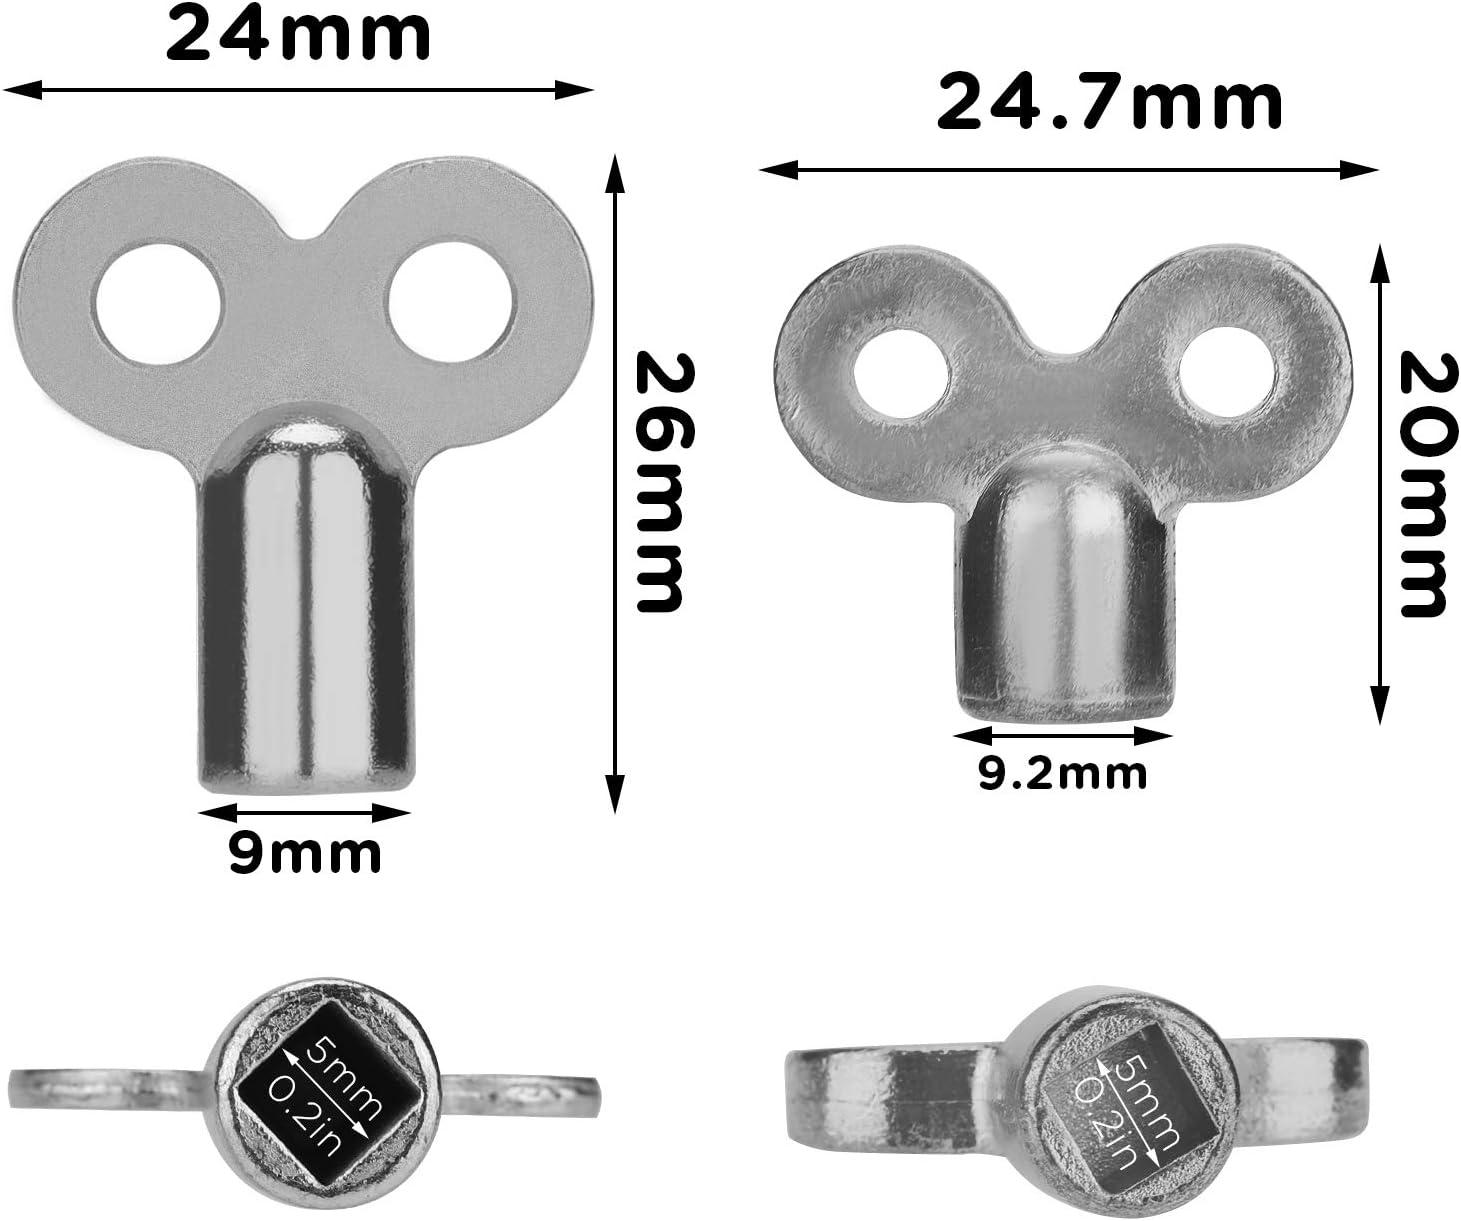 LUTER 10Pcs Radiator Valve Keys Radiator Bleed Hole Key Radiator Vent Air Valve Lock Key Plumbing Valve Key for Radiators and Faucet Silver